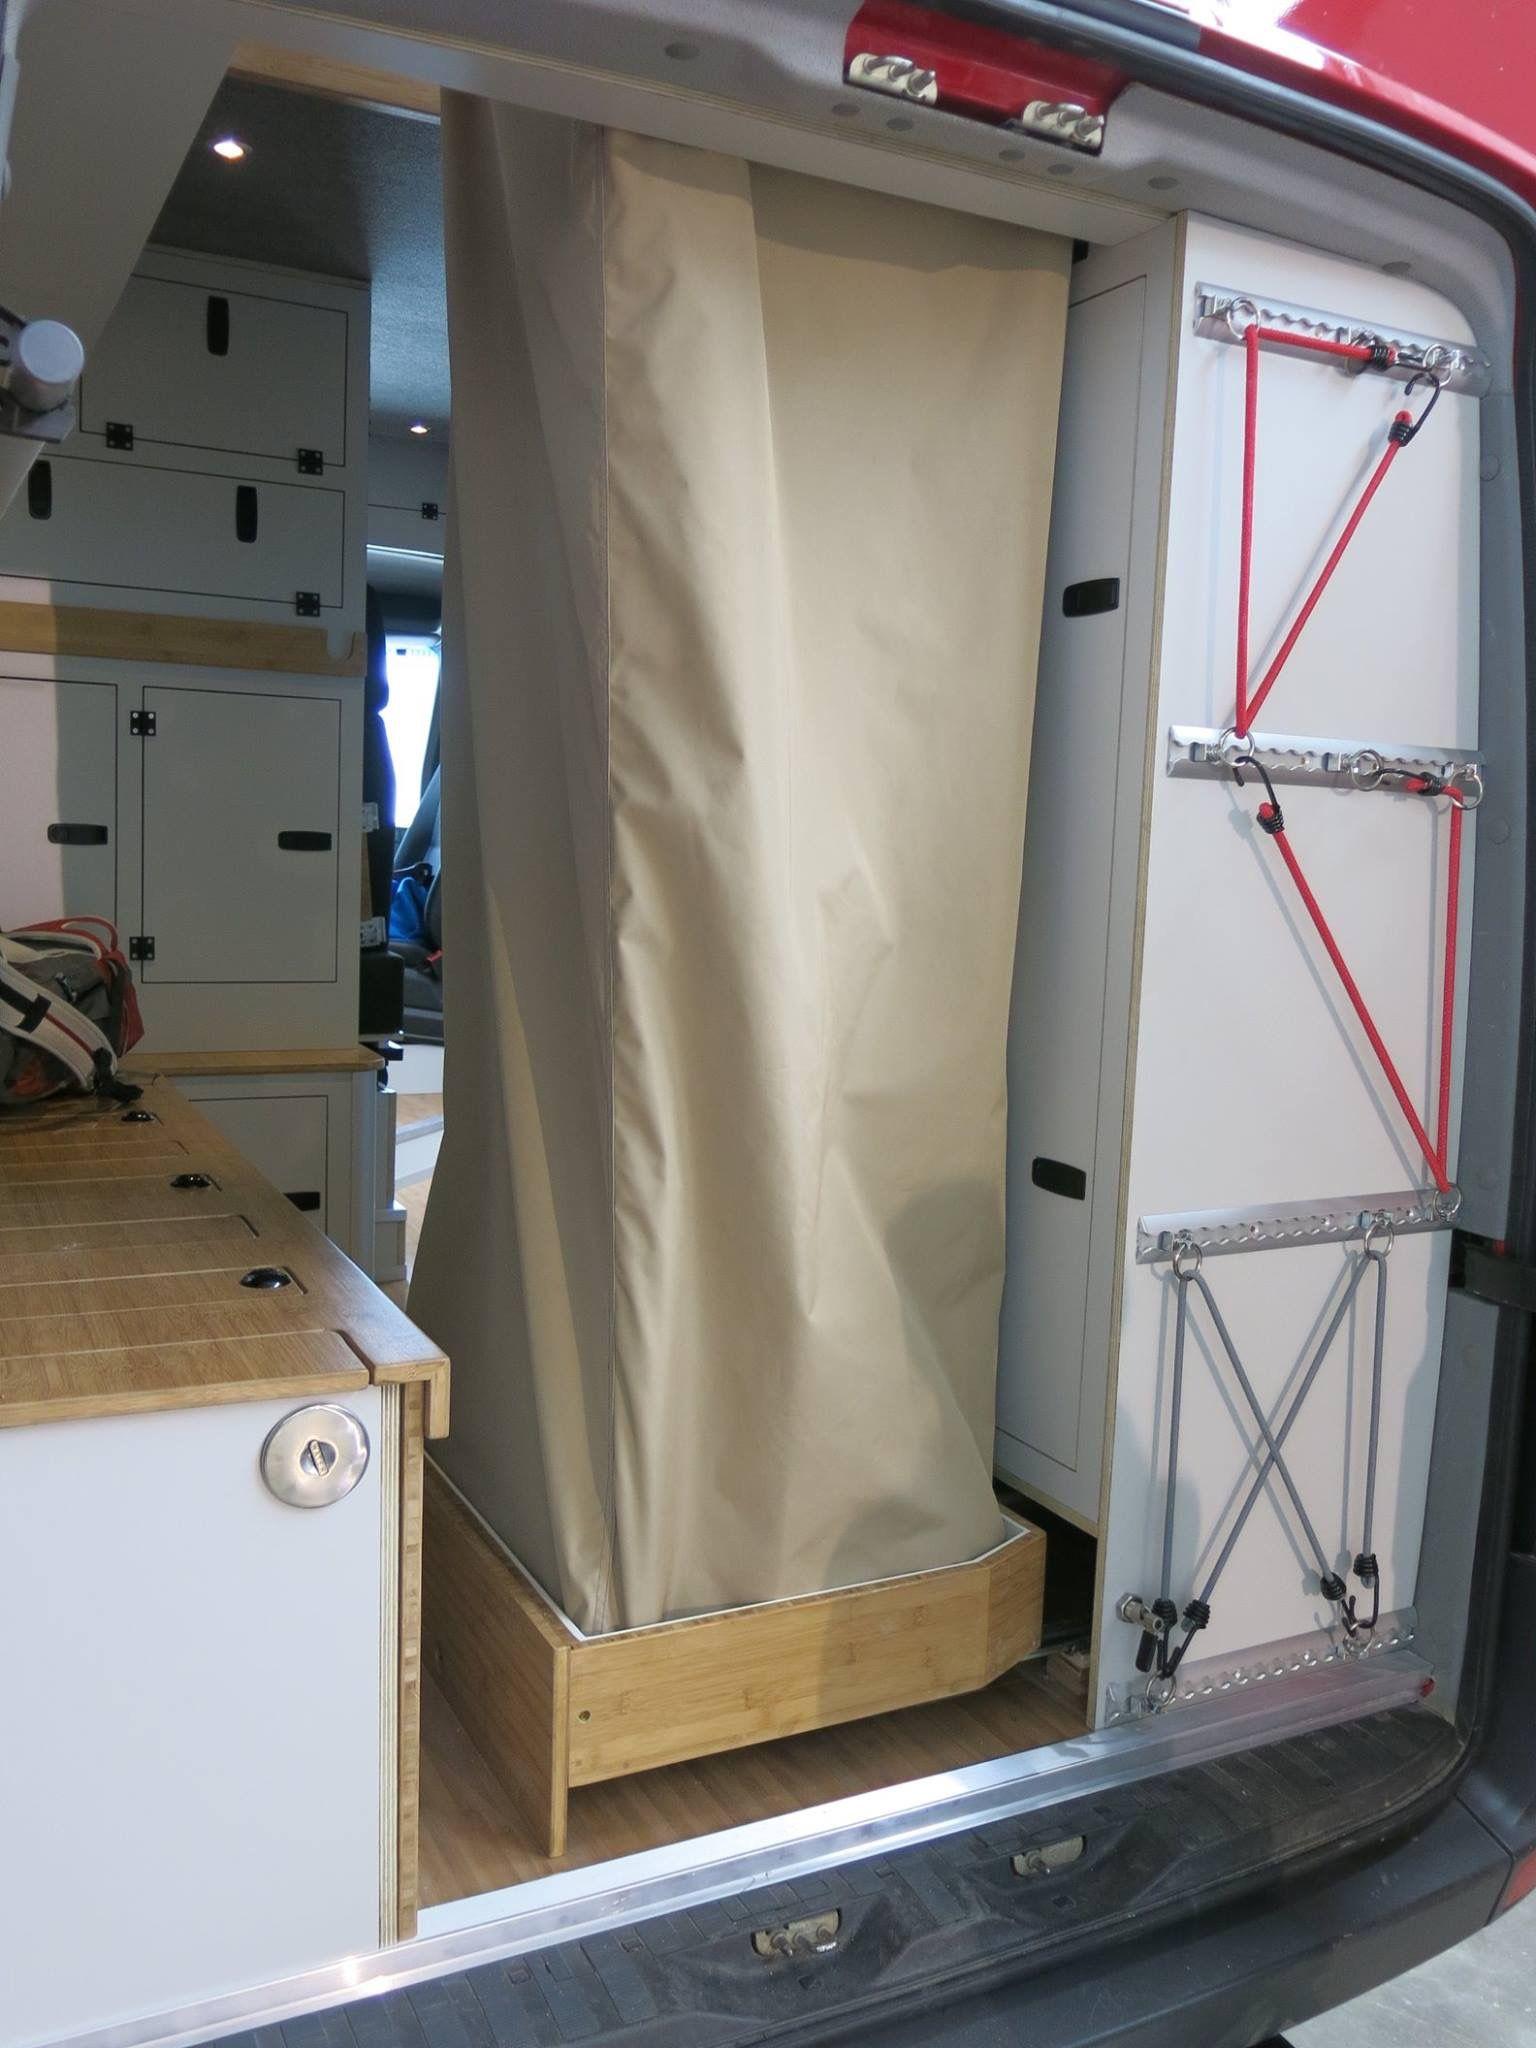 URO Camper Ausziehbare Duschkabine A pullout drawer could